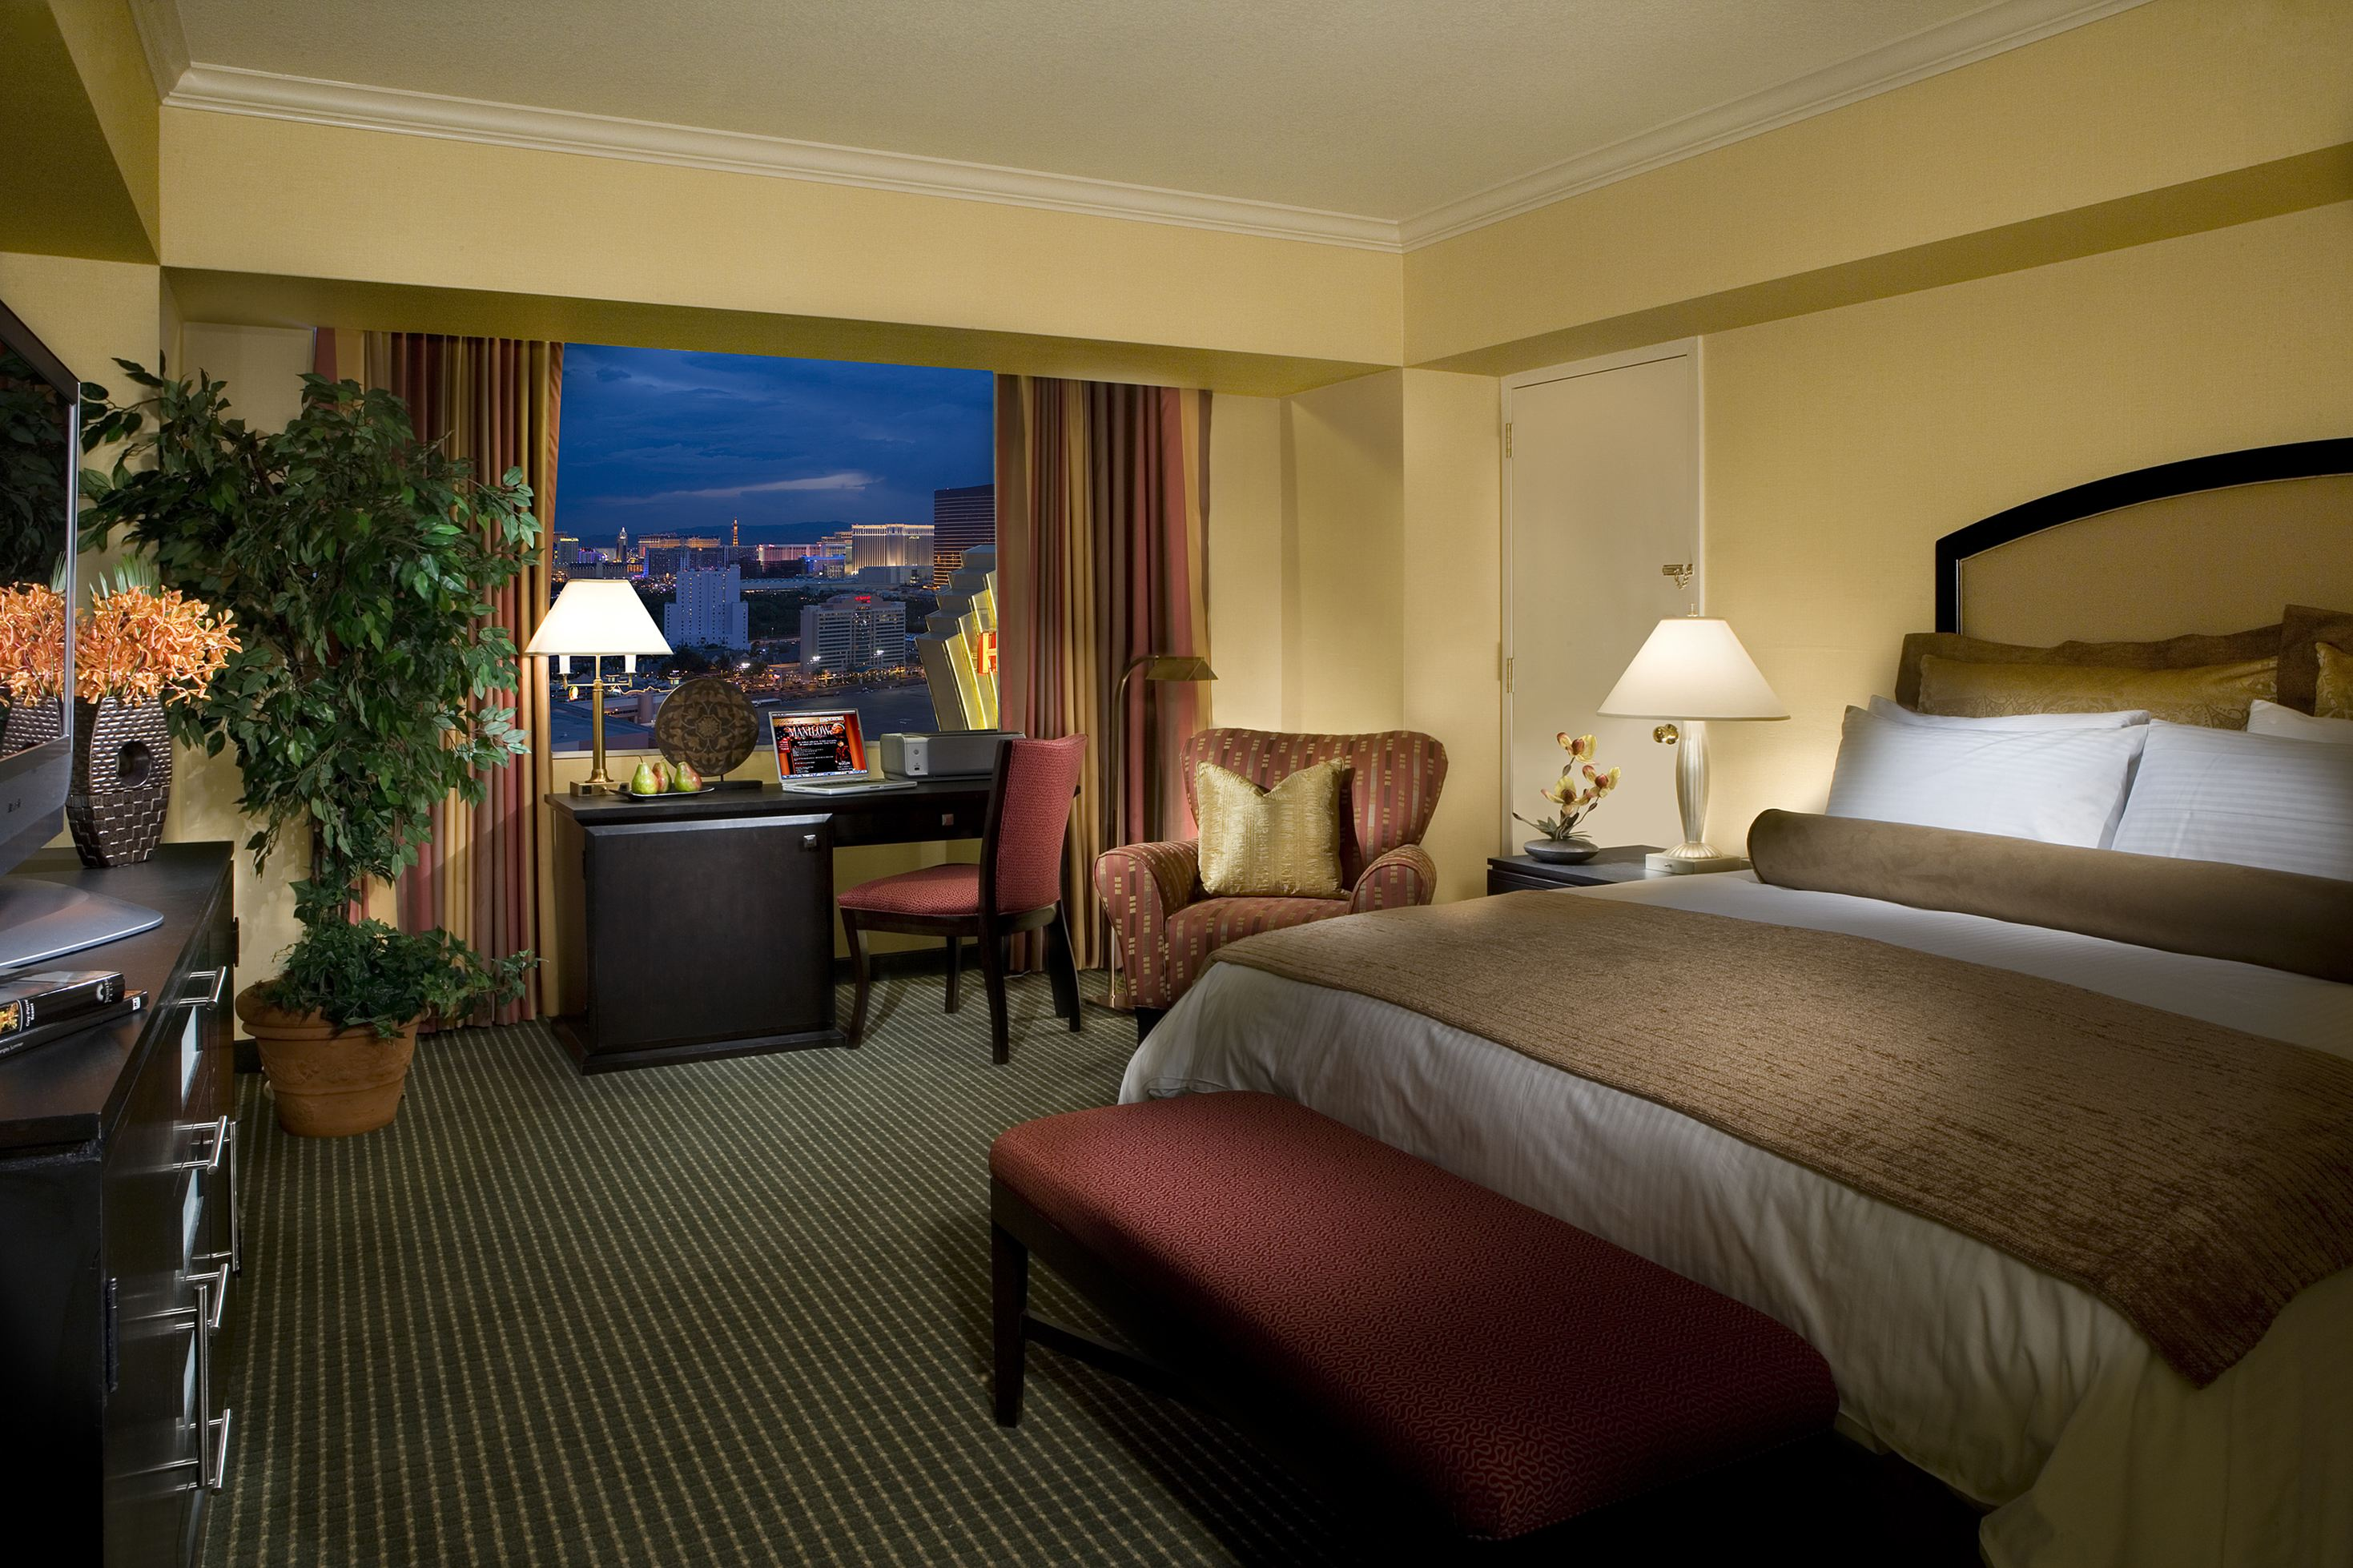 Vip Hotel Information